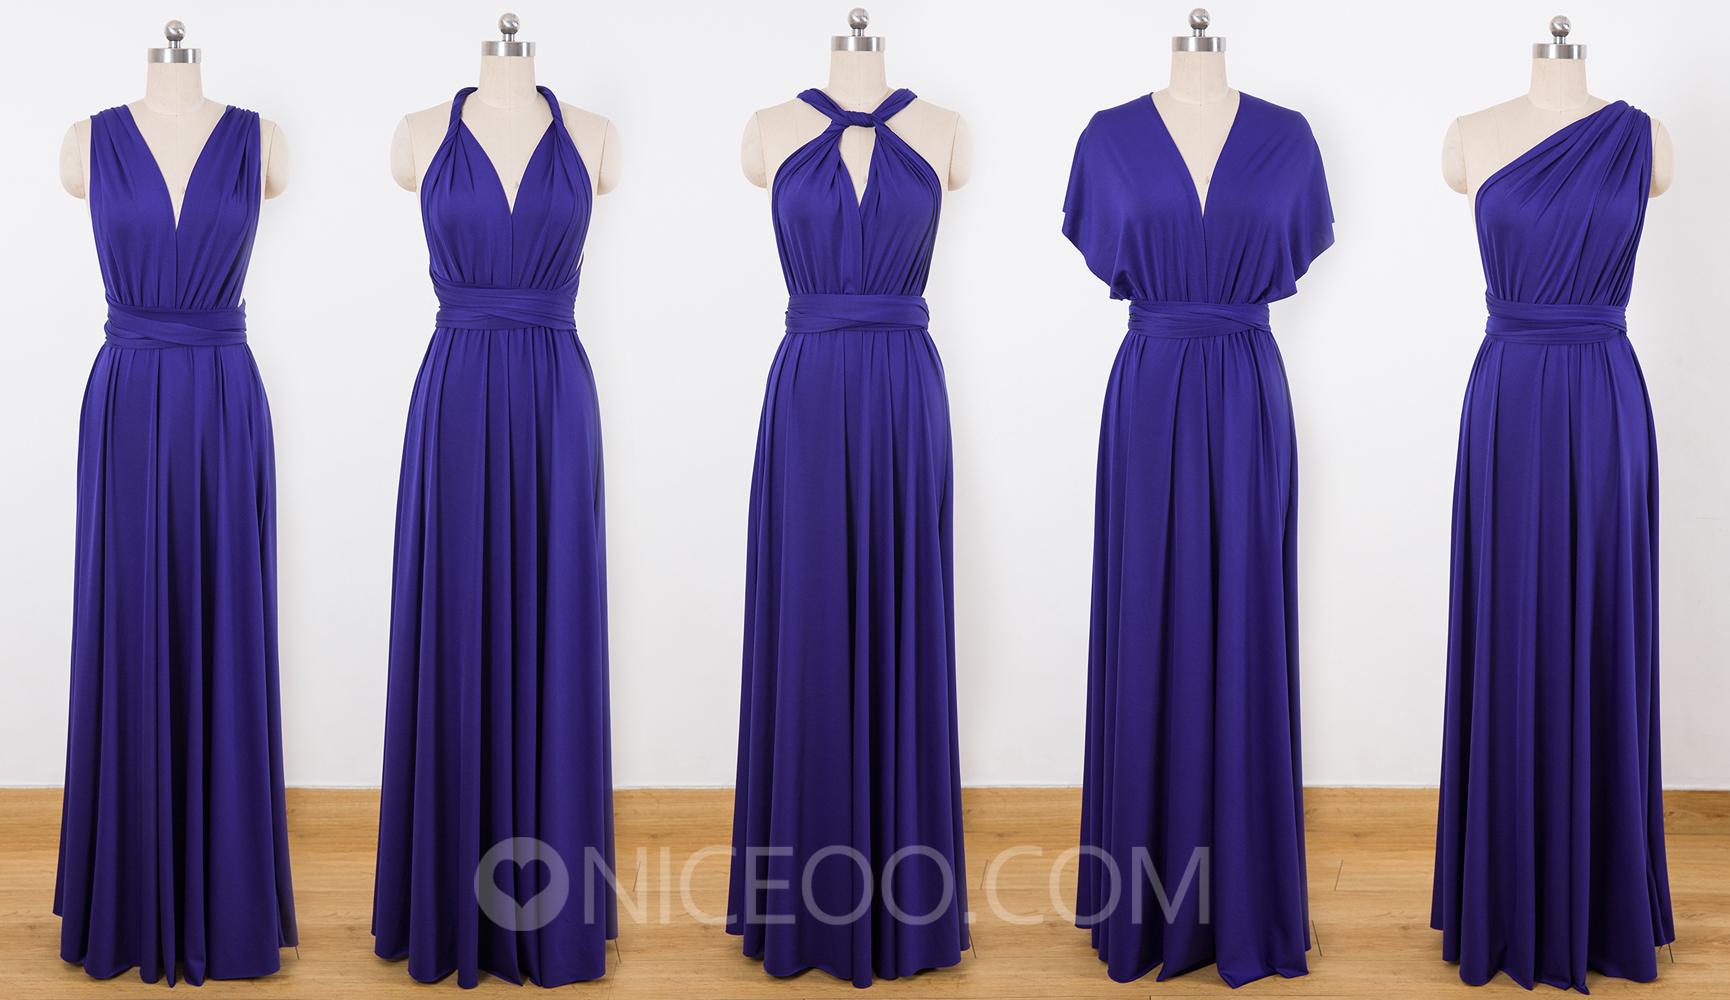 Convertable Bridesmaid Dress, Multiway Wrap Dress, Purple Infinity ...